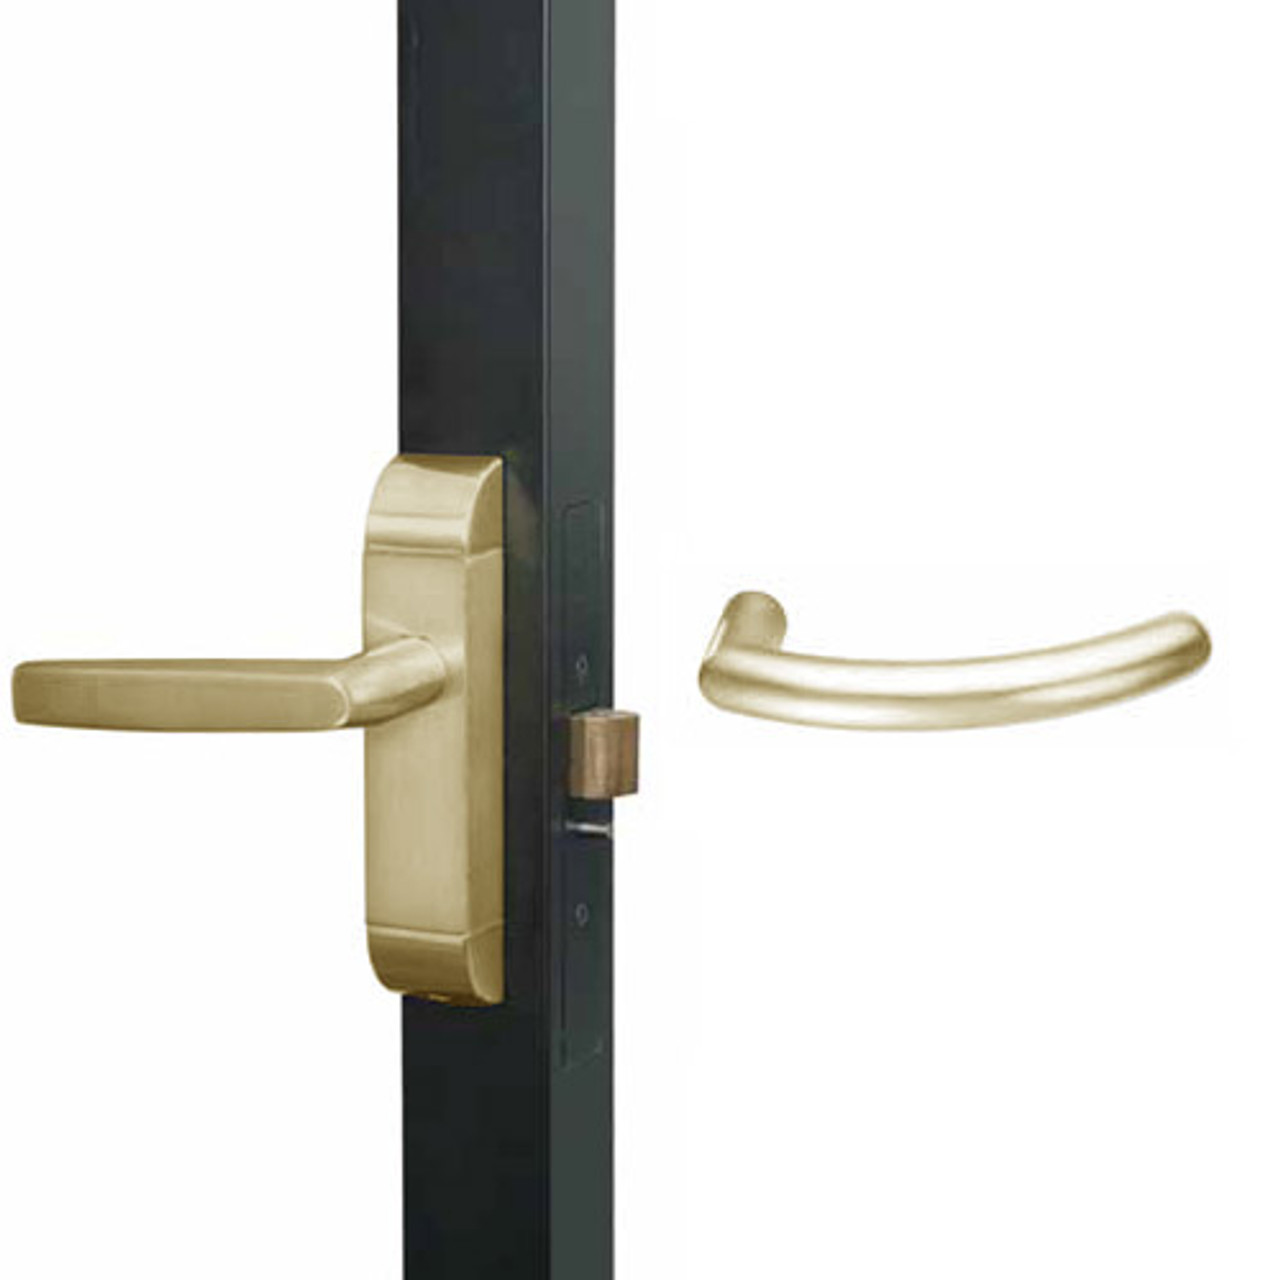 4600-MG-631-US4 Adams Rite MG Designer Deadlatch handle in Satin Brass Finish